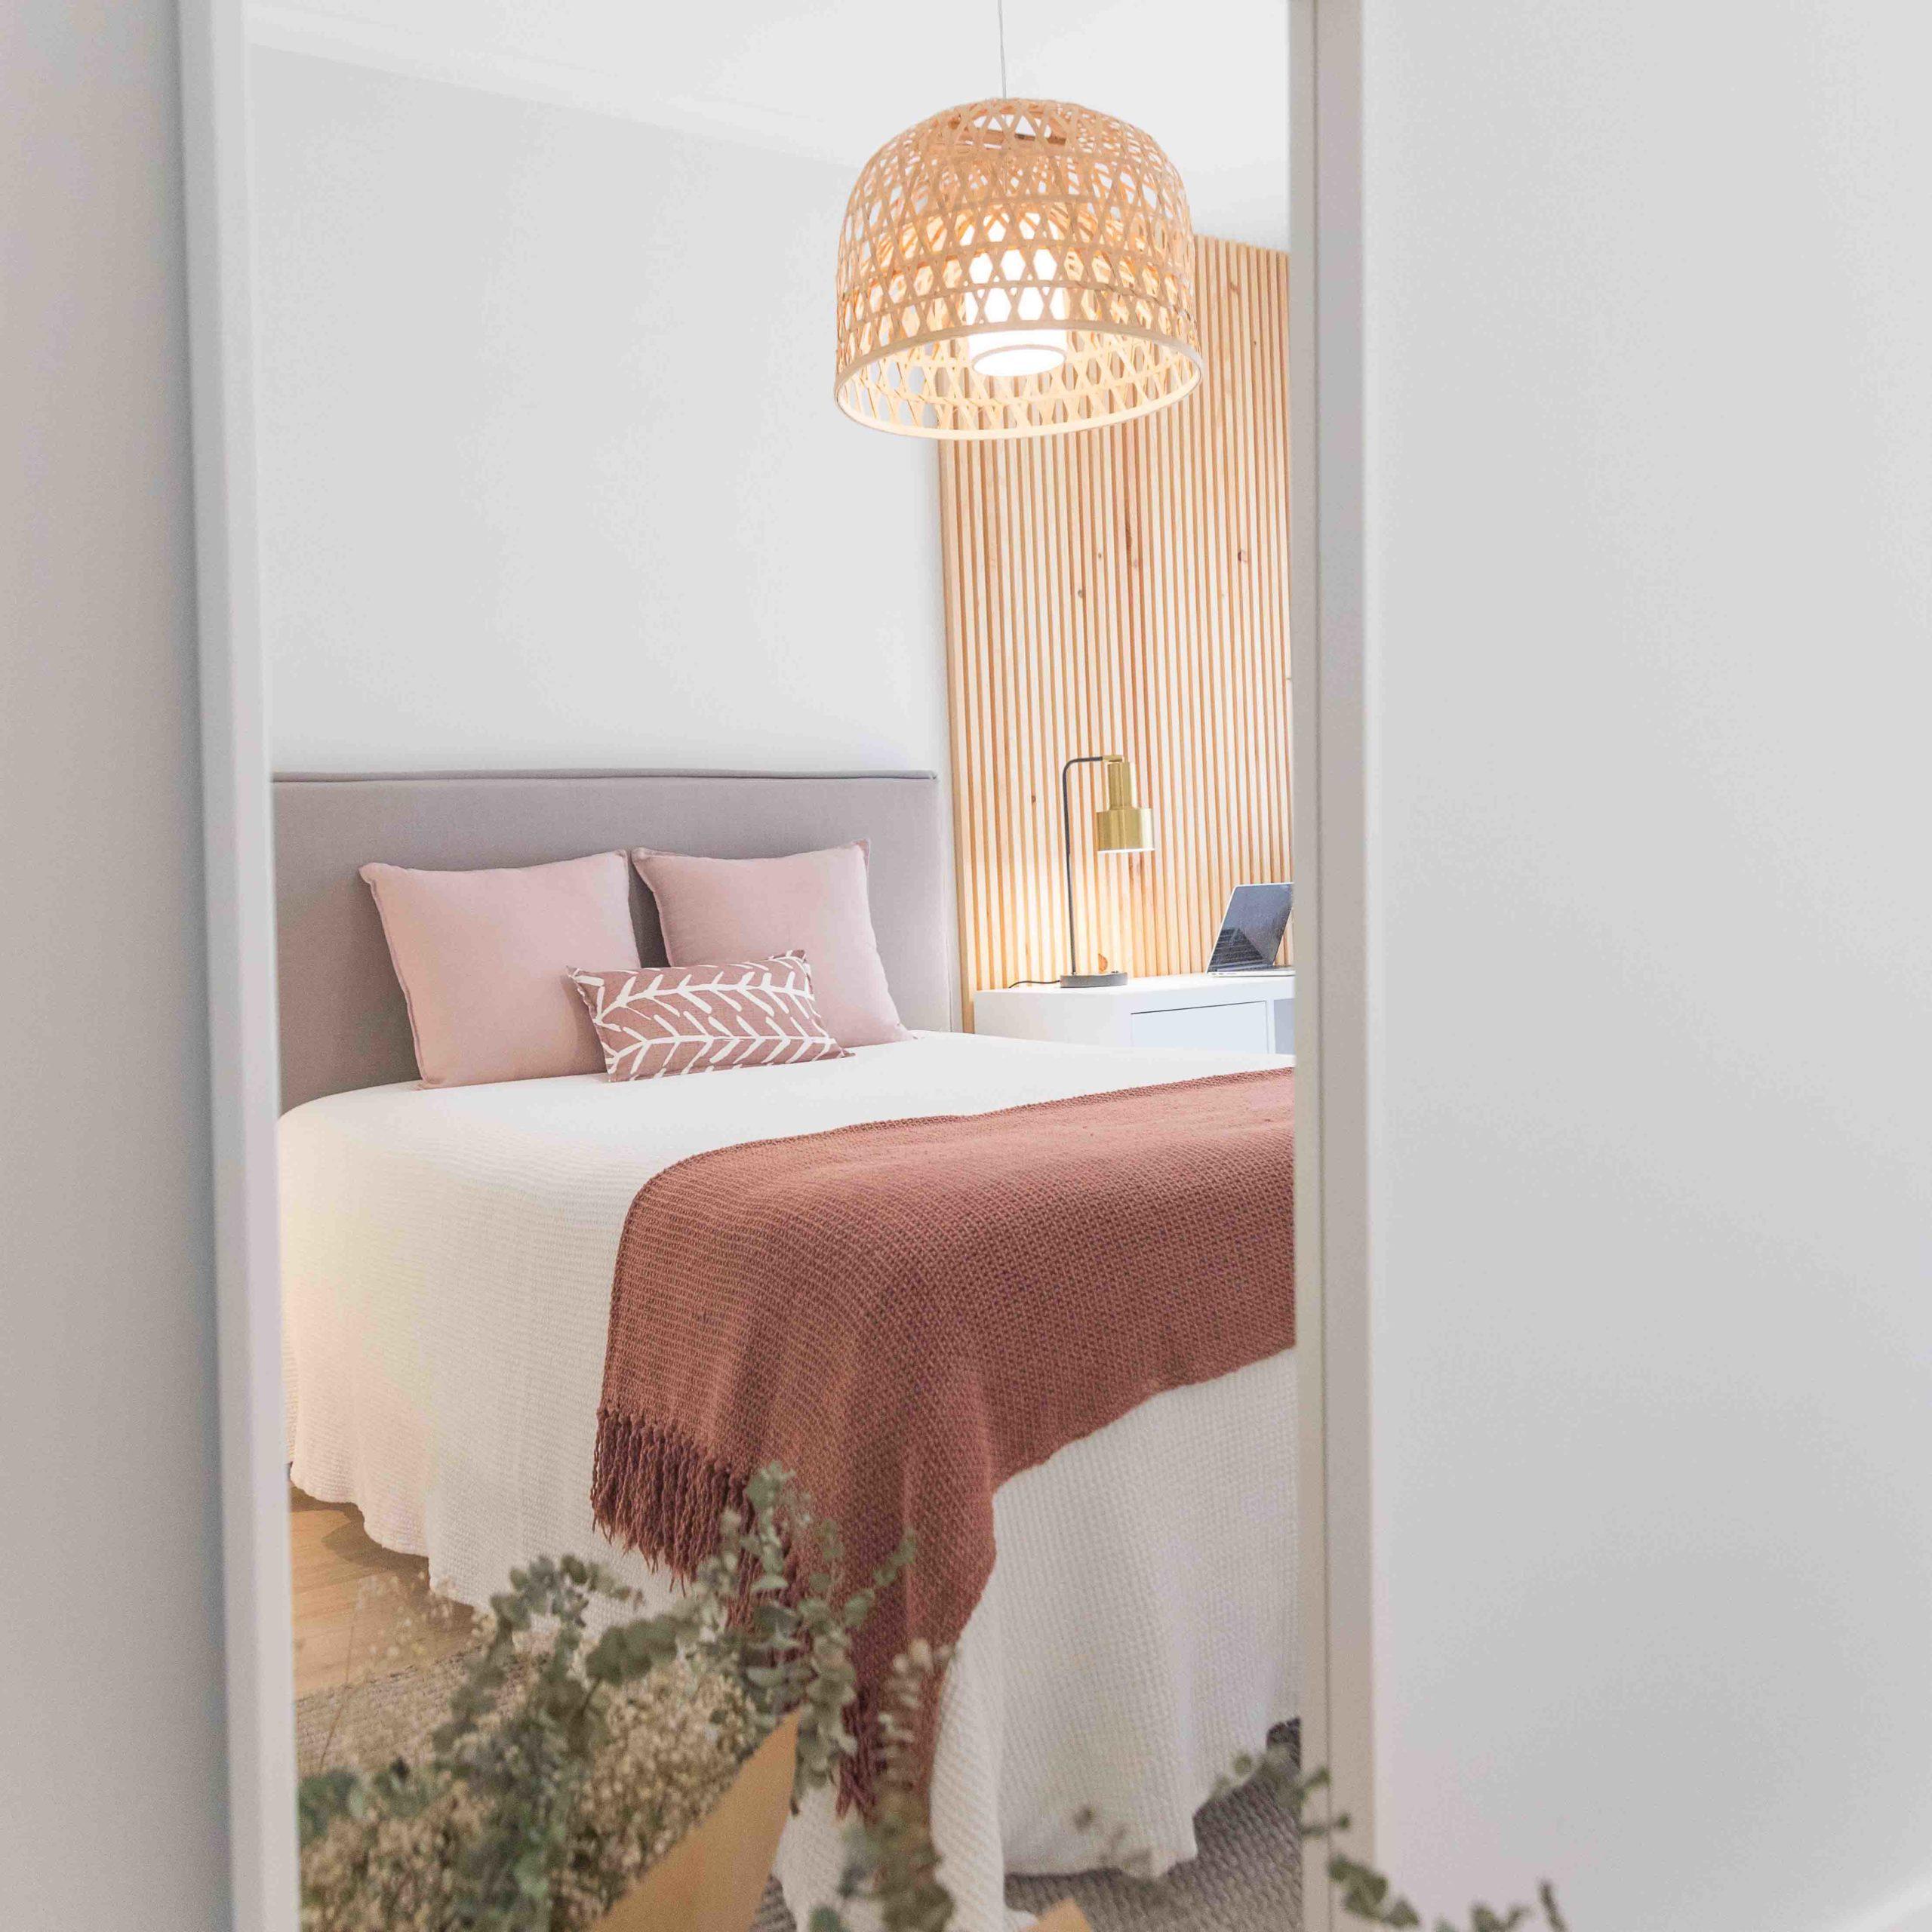 Appartement-meublé-Investissement-locatif-ImAvenir